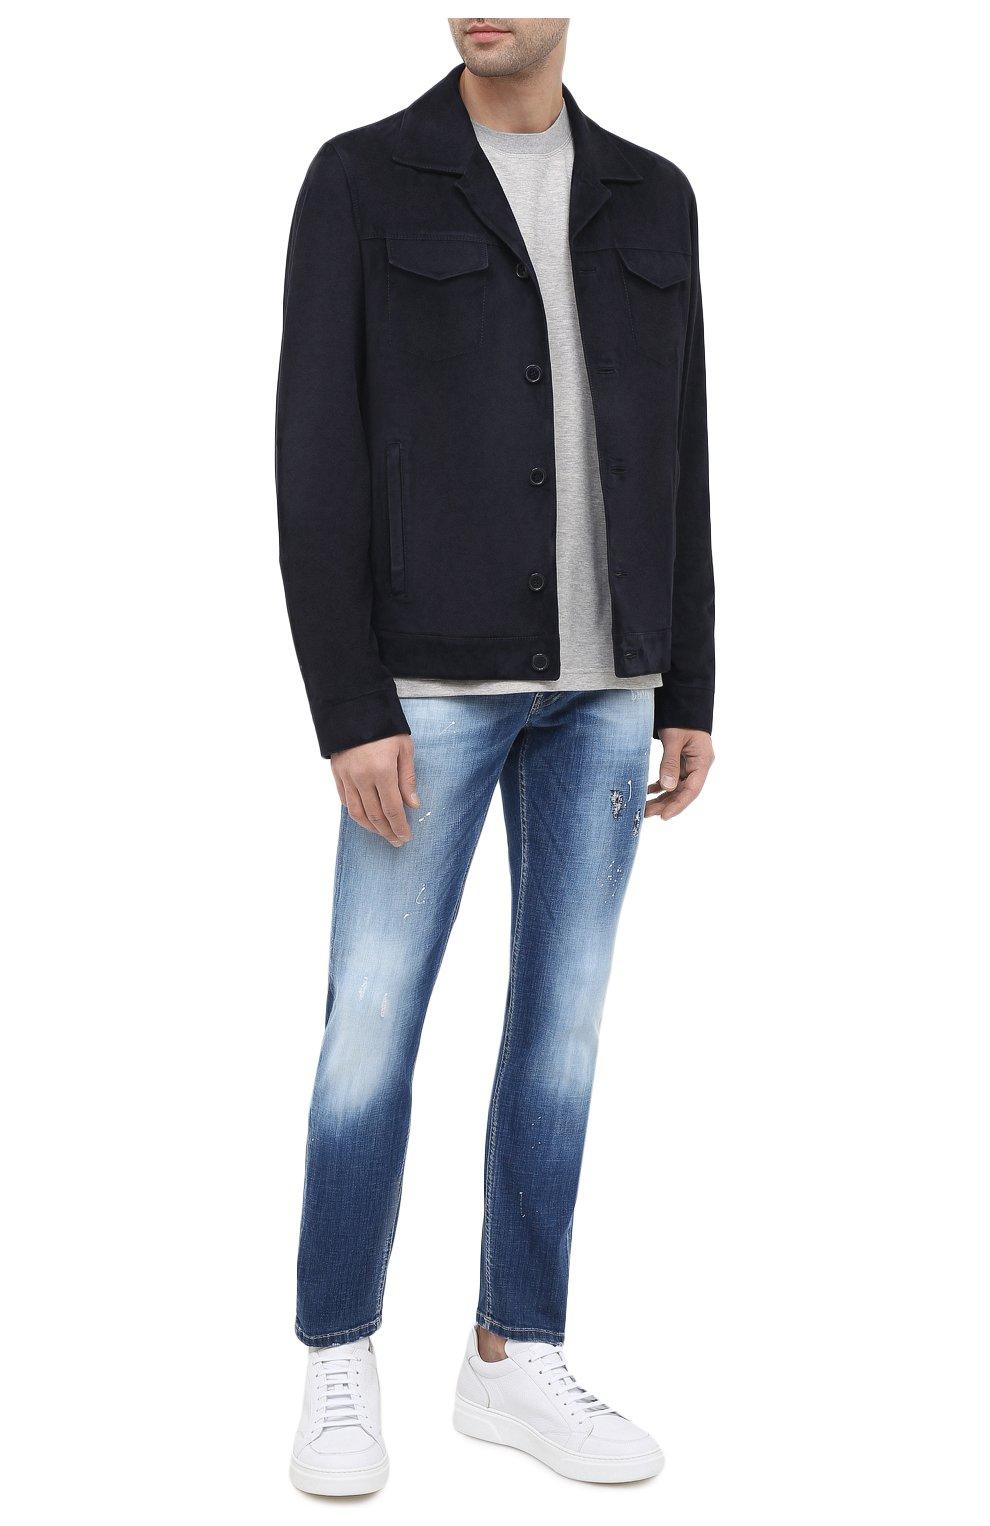 Мужские джинсы PREMIUM MOOD DENIM SUPERIOR синего цвета, арт. F21 310340025/PAUL   Фото 2